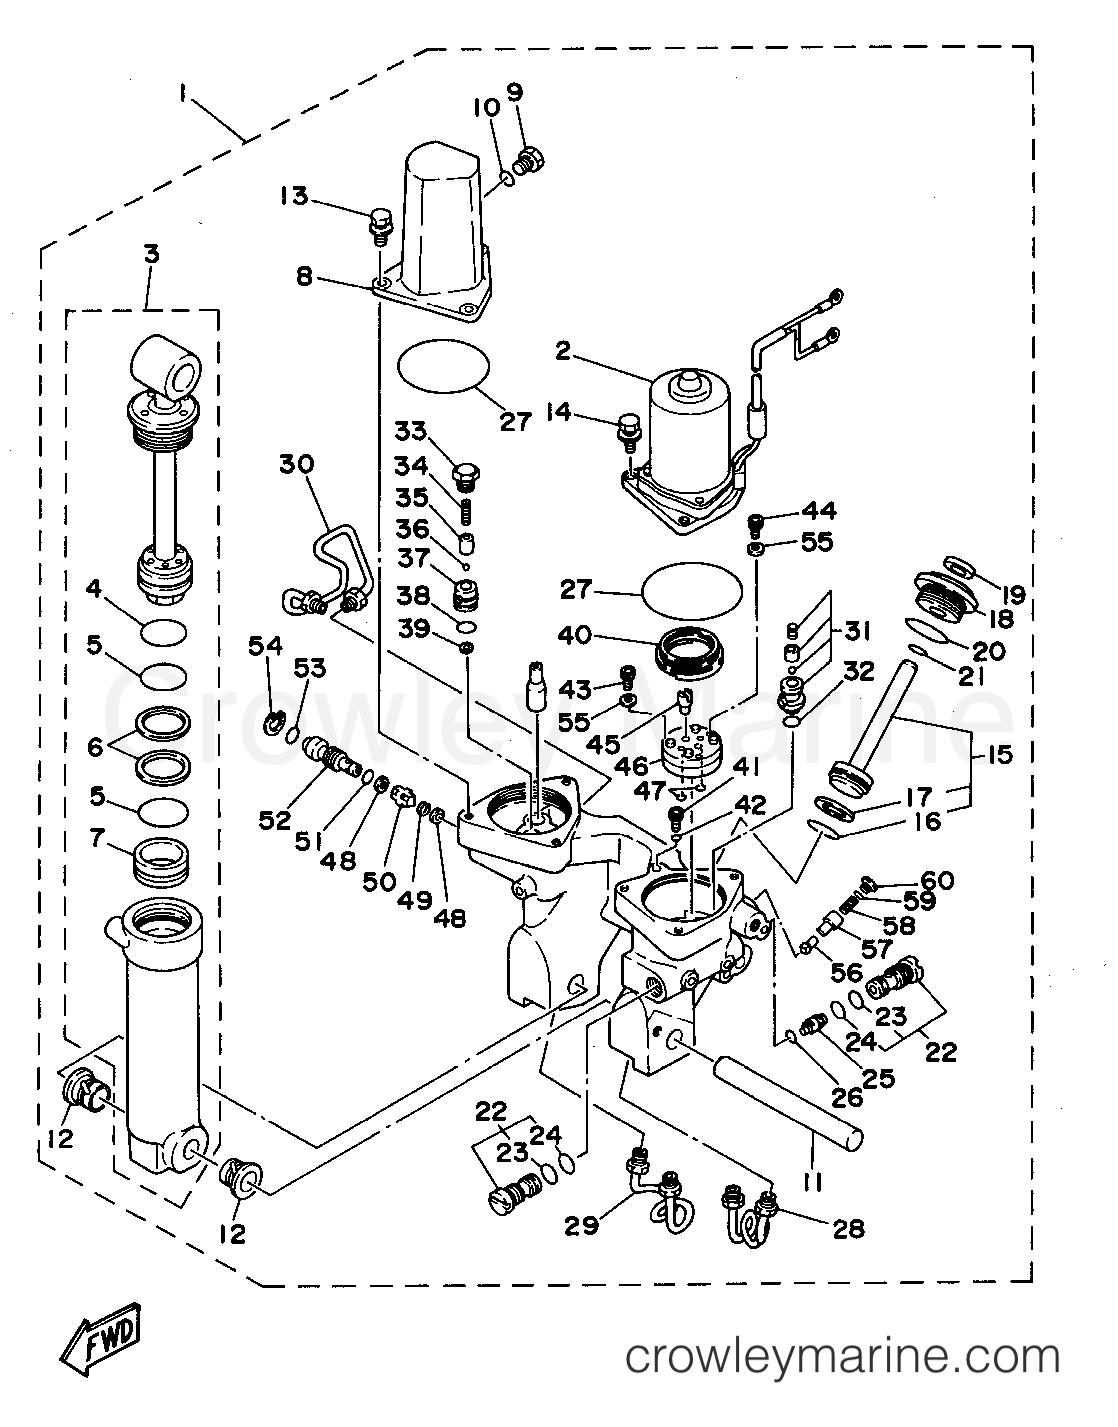 Power Trim Tilt Assembly 2 40tr